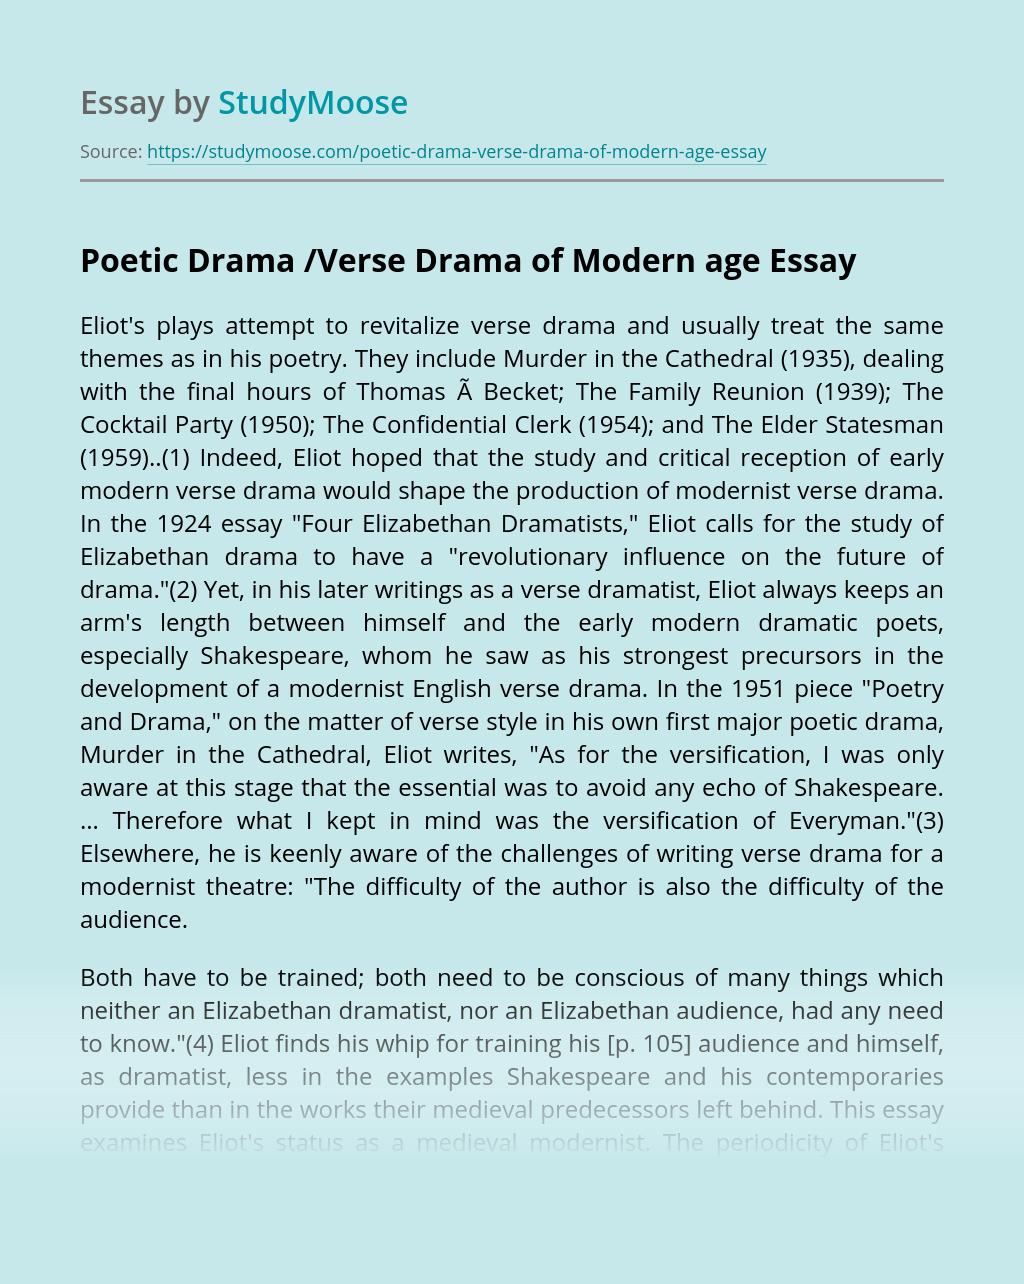 Poetic Drama /Verse Drama of Modern age